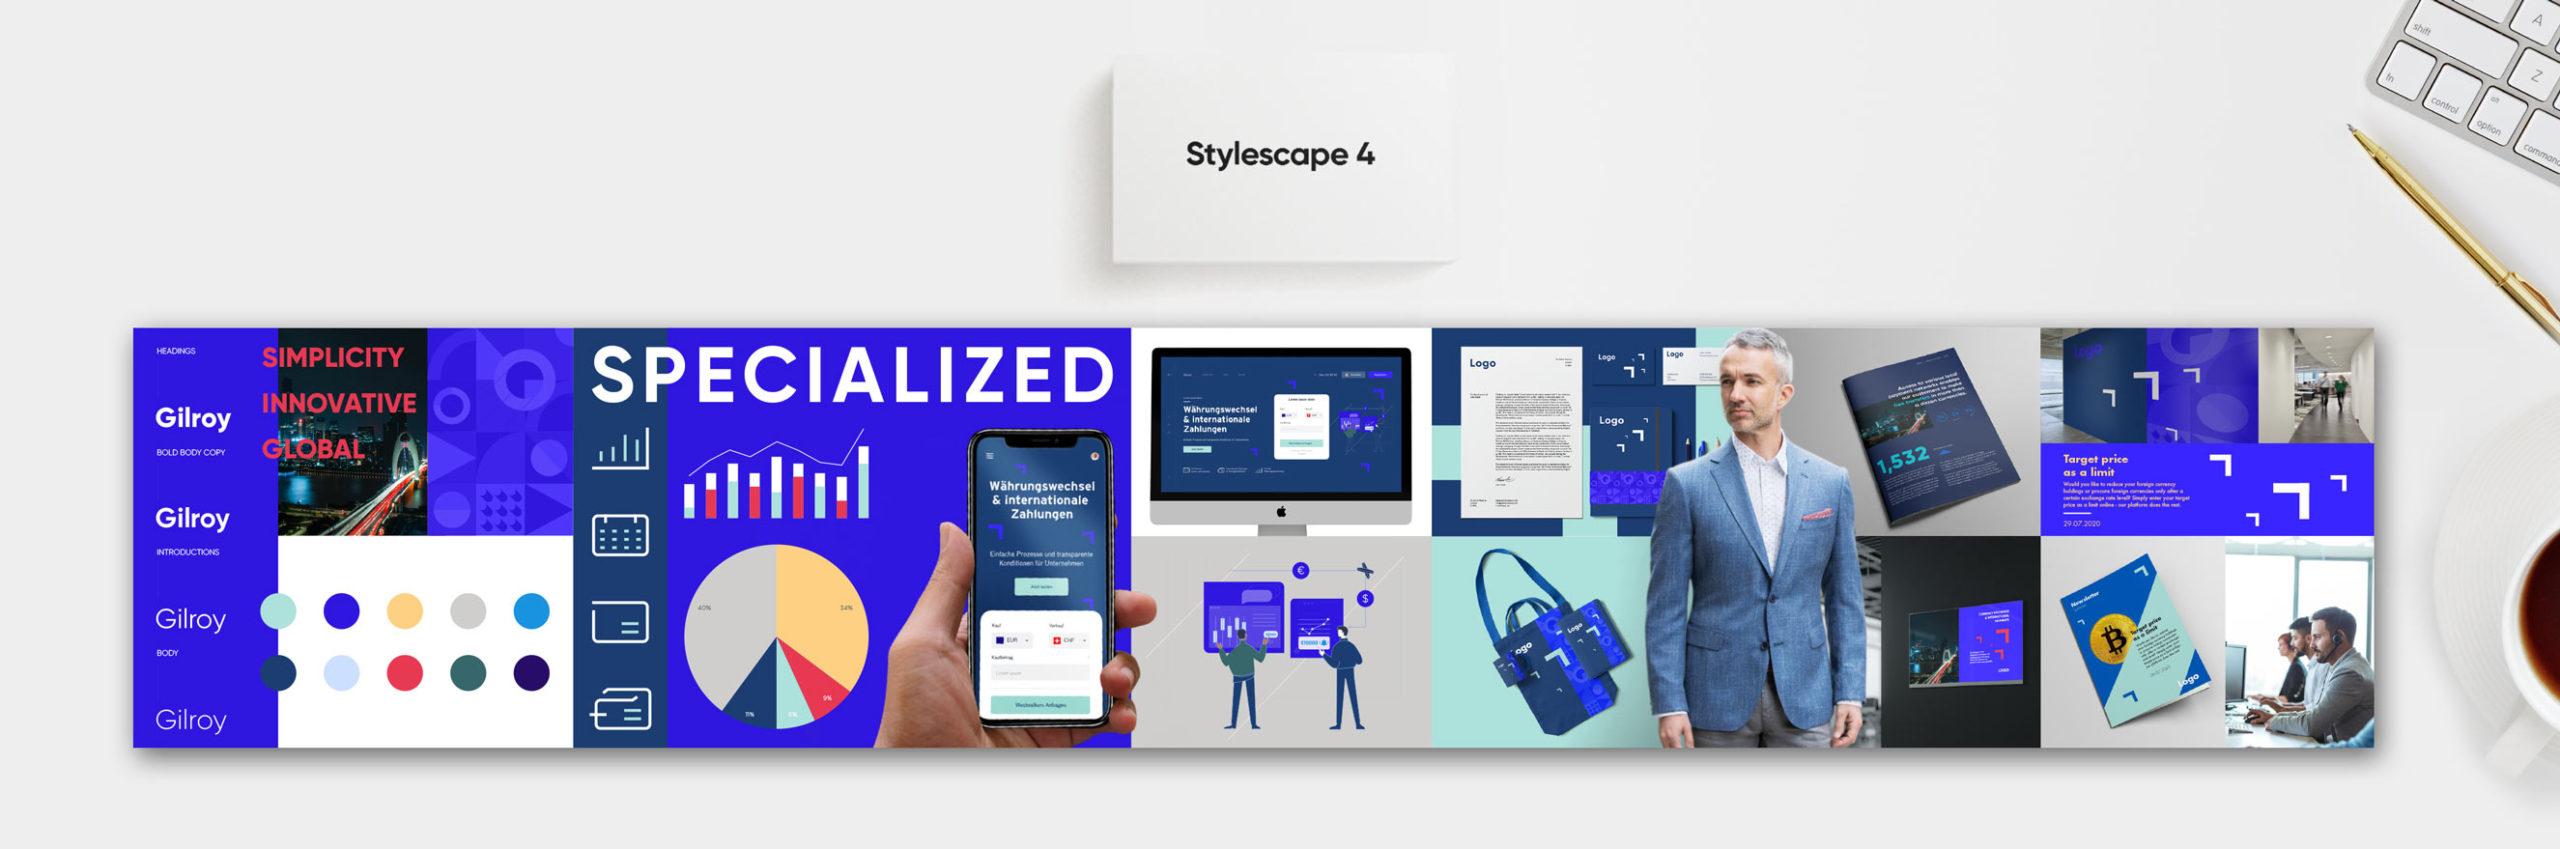 branding stylescape option